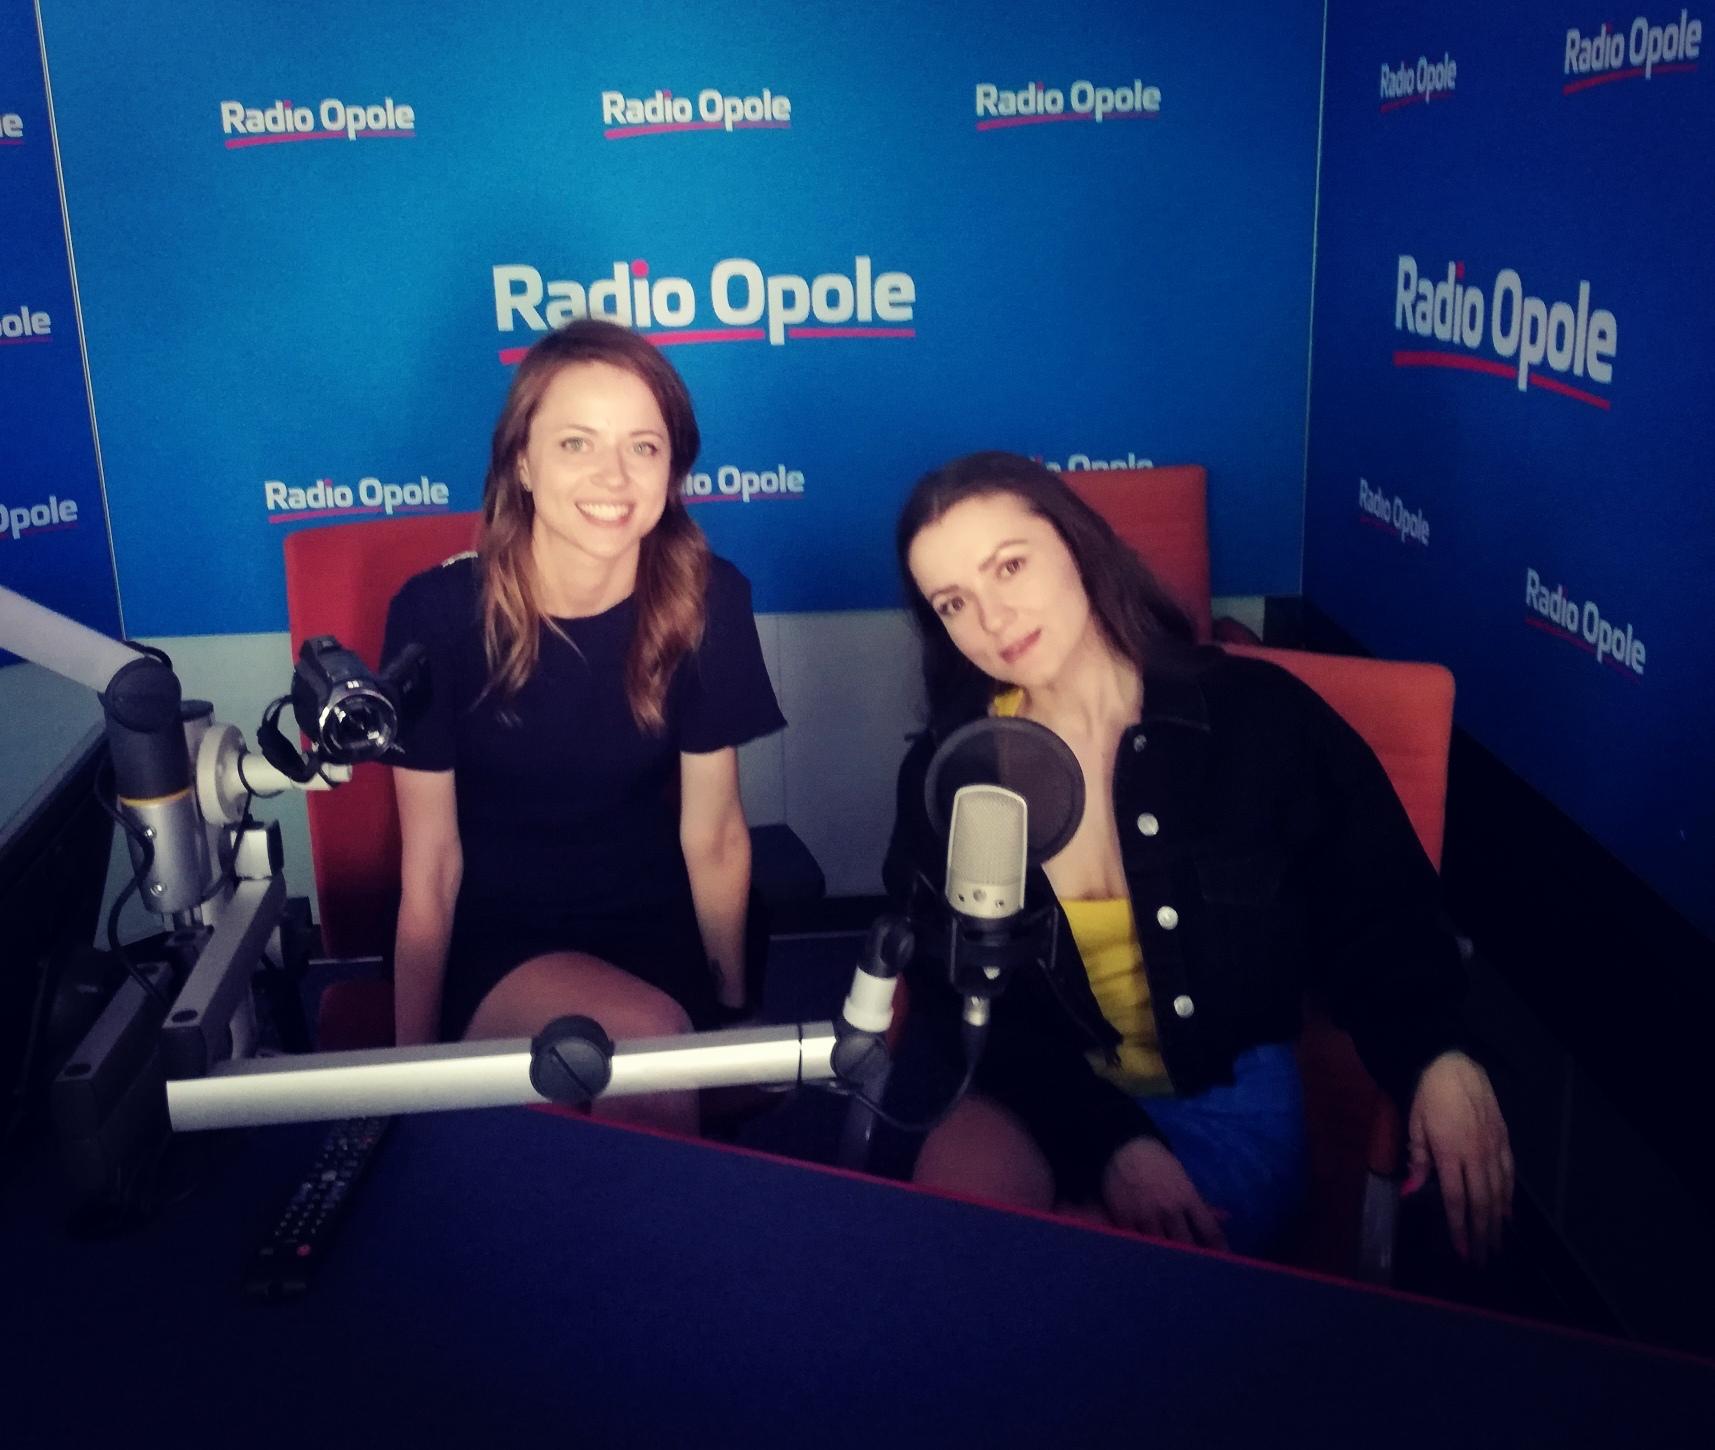 Lanberry i Anita Janczak w studiu Radia Opole